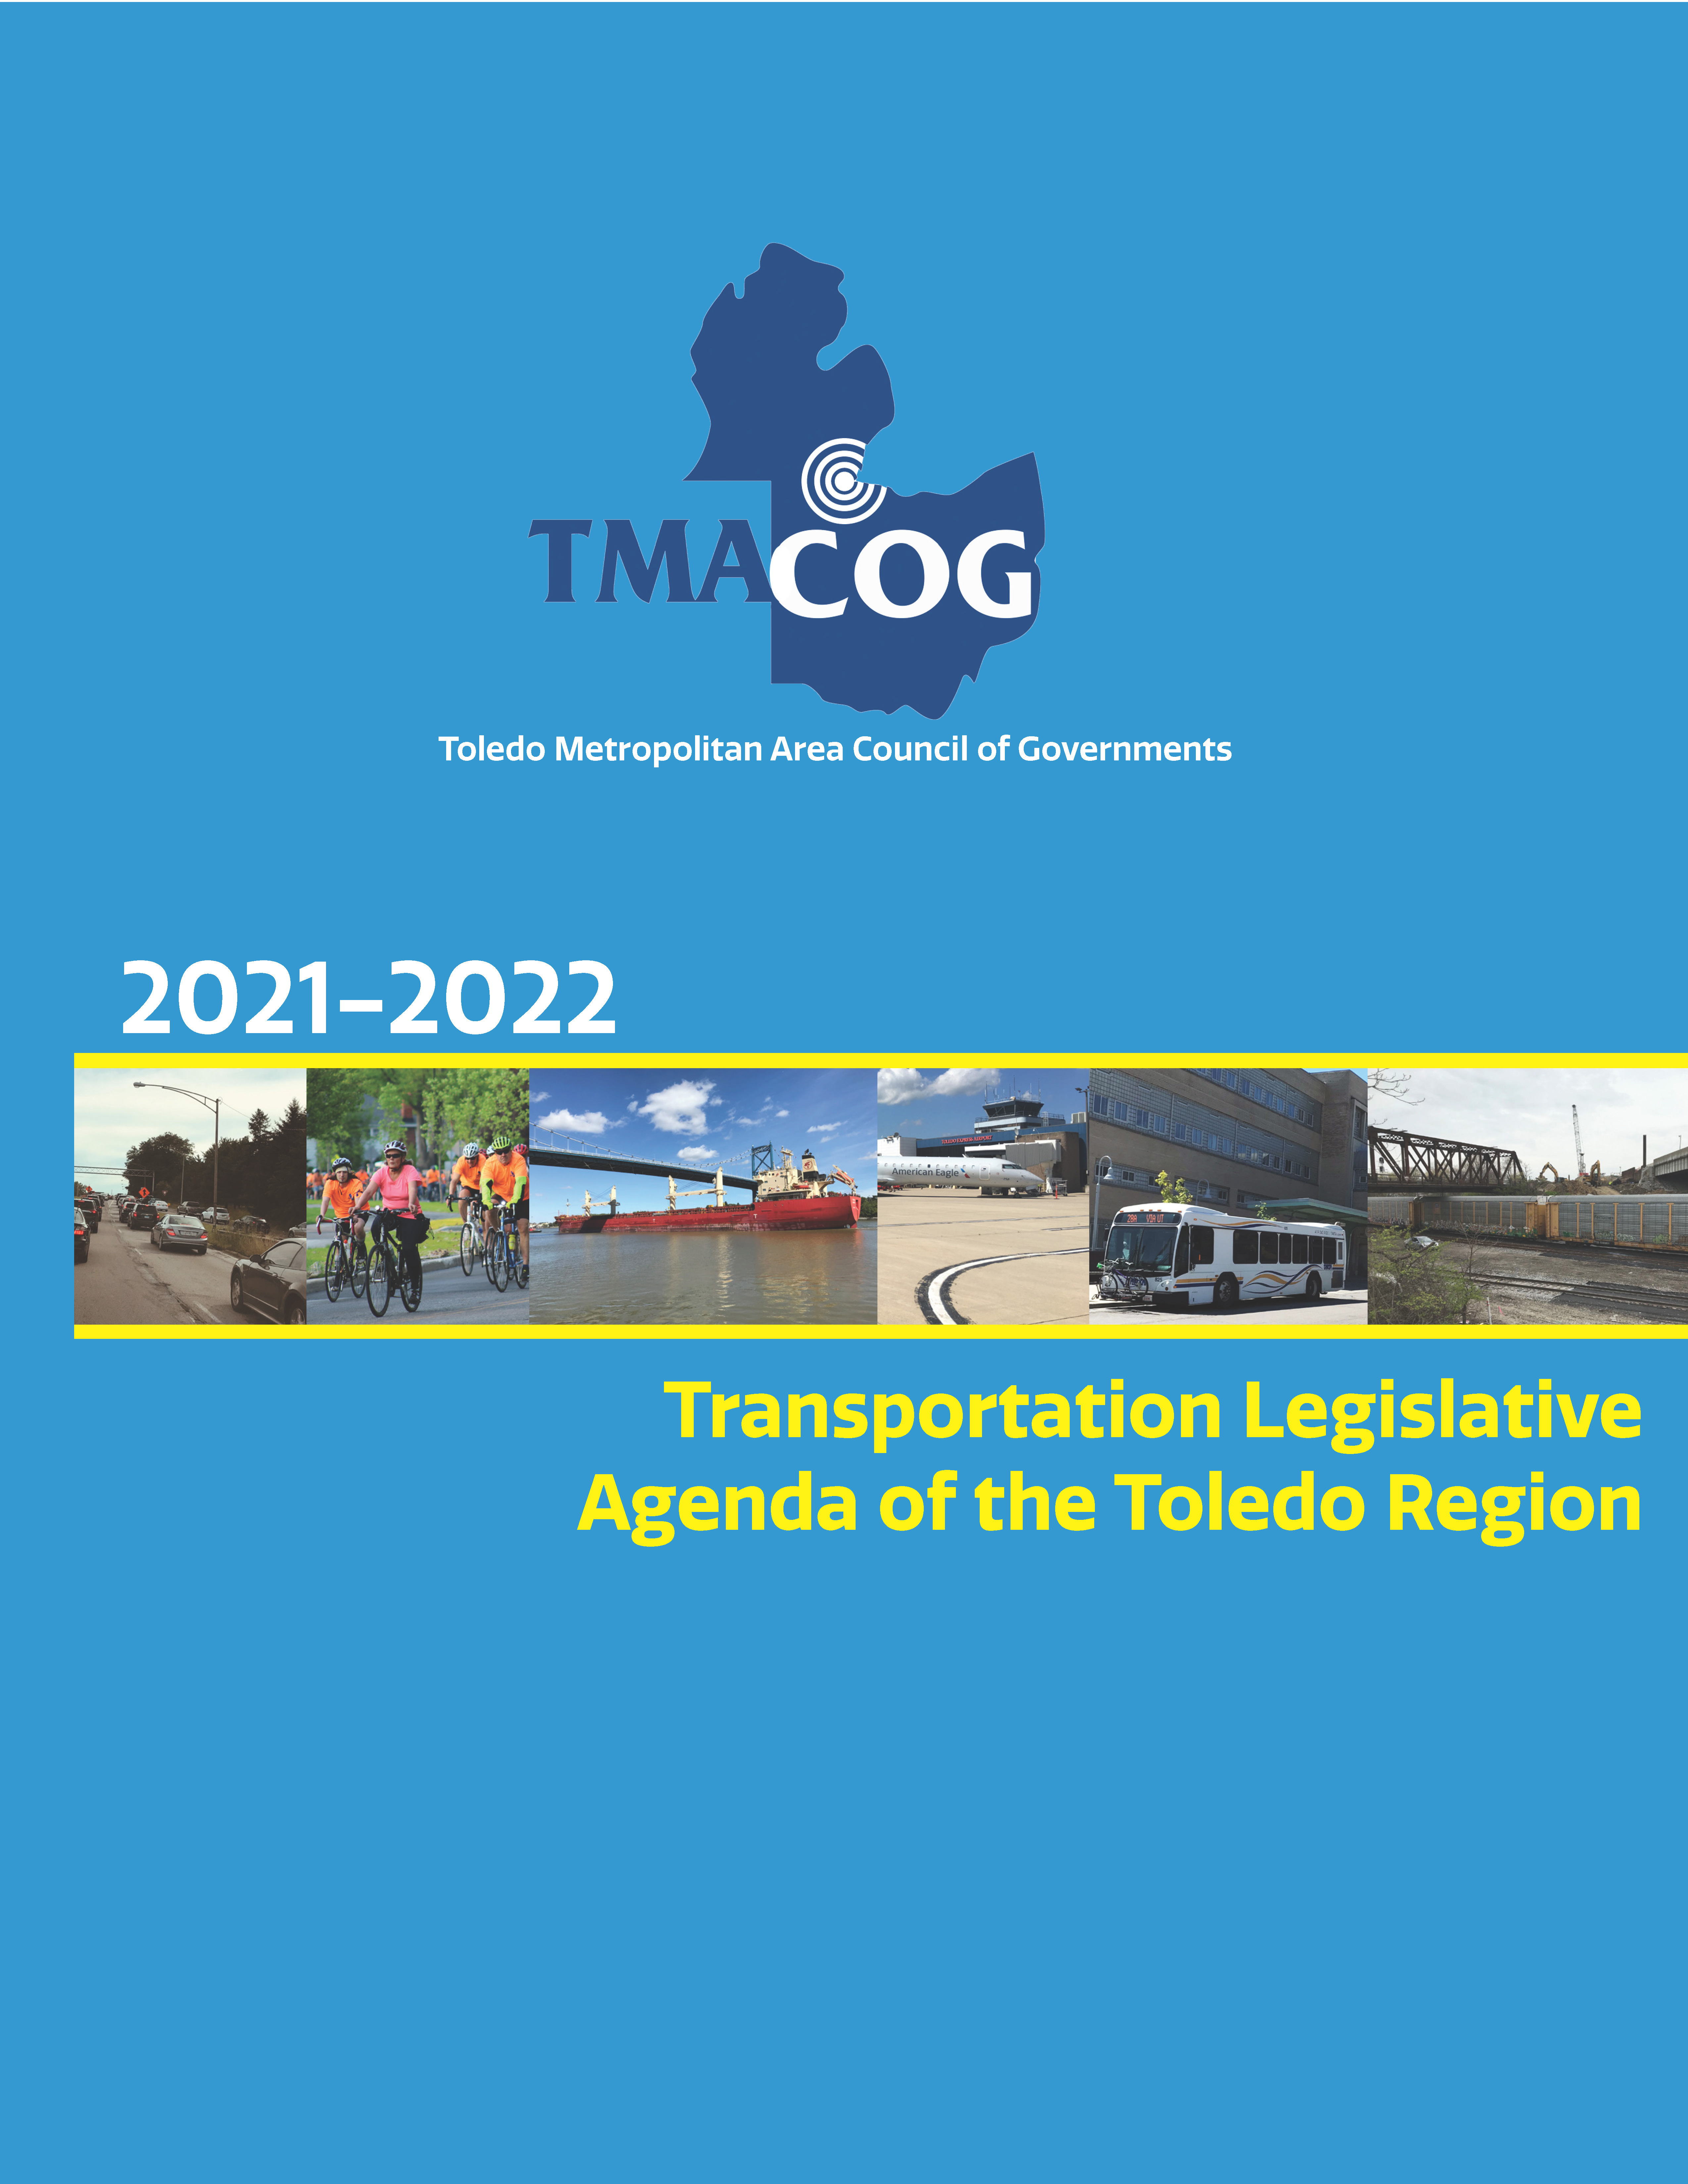 2021-2022 Transportation Legislative Agenda